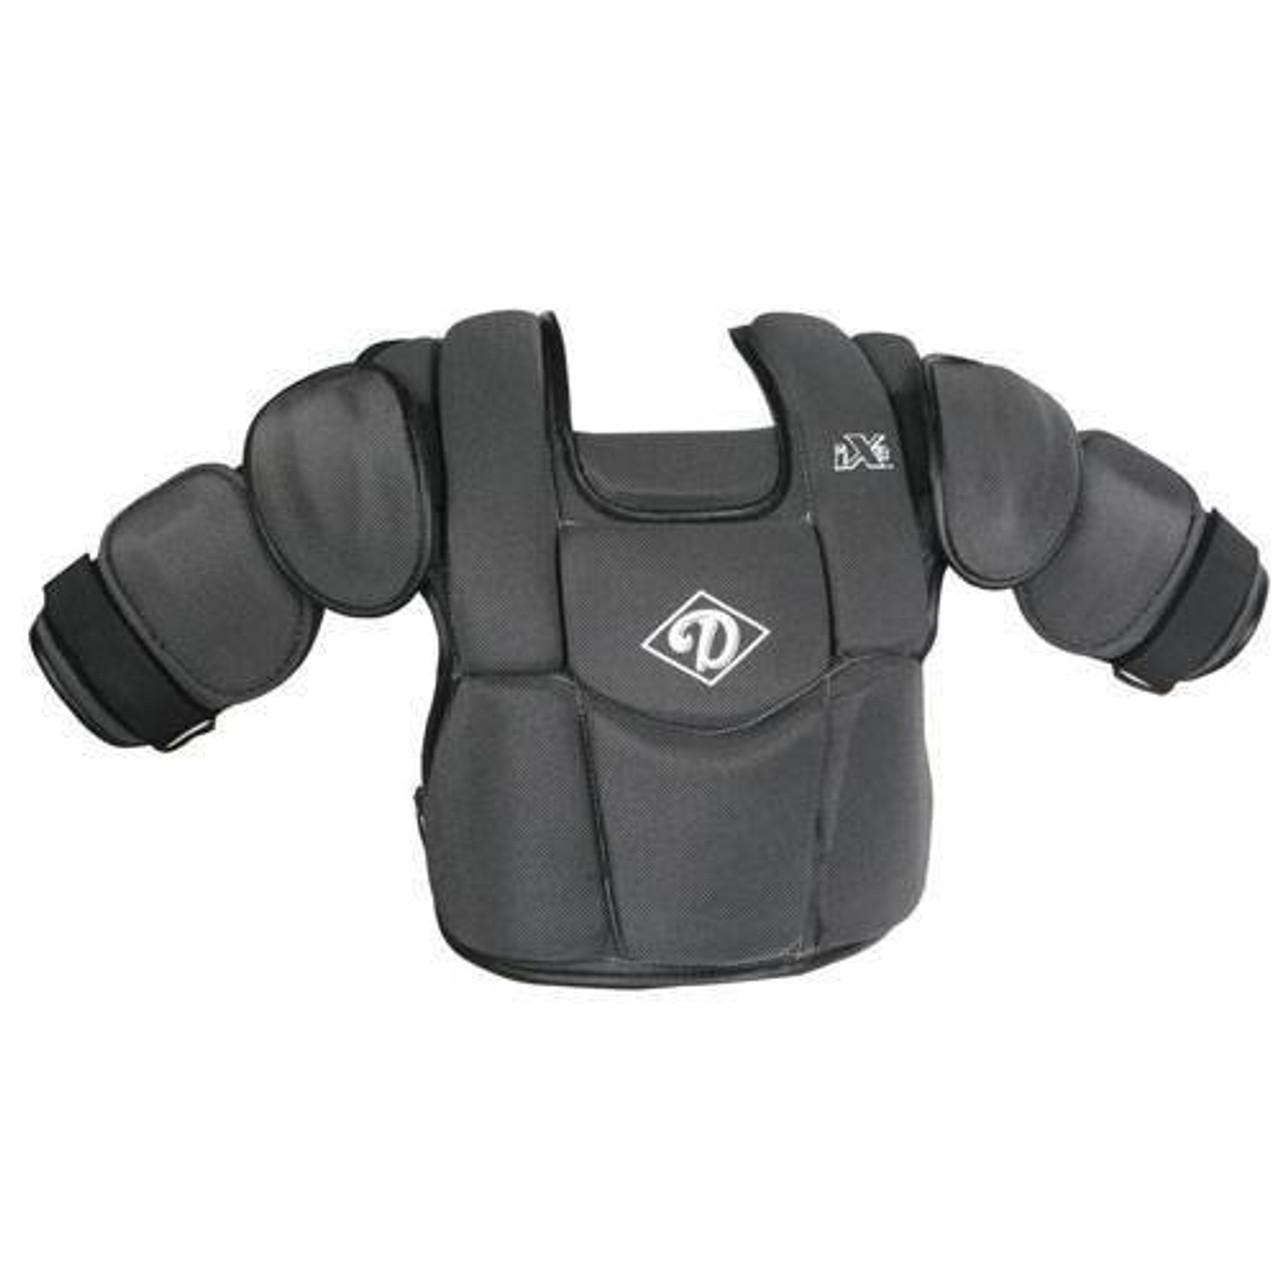 DCP-iX3 Baseball Umpire Chest Protector